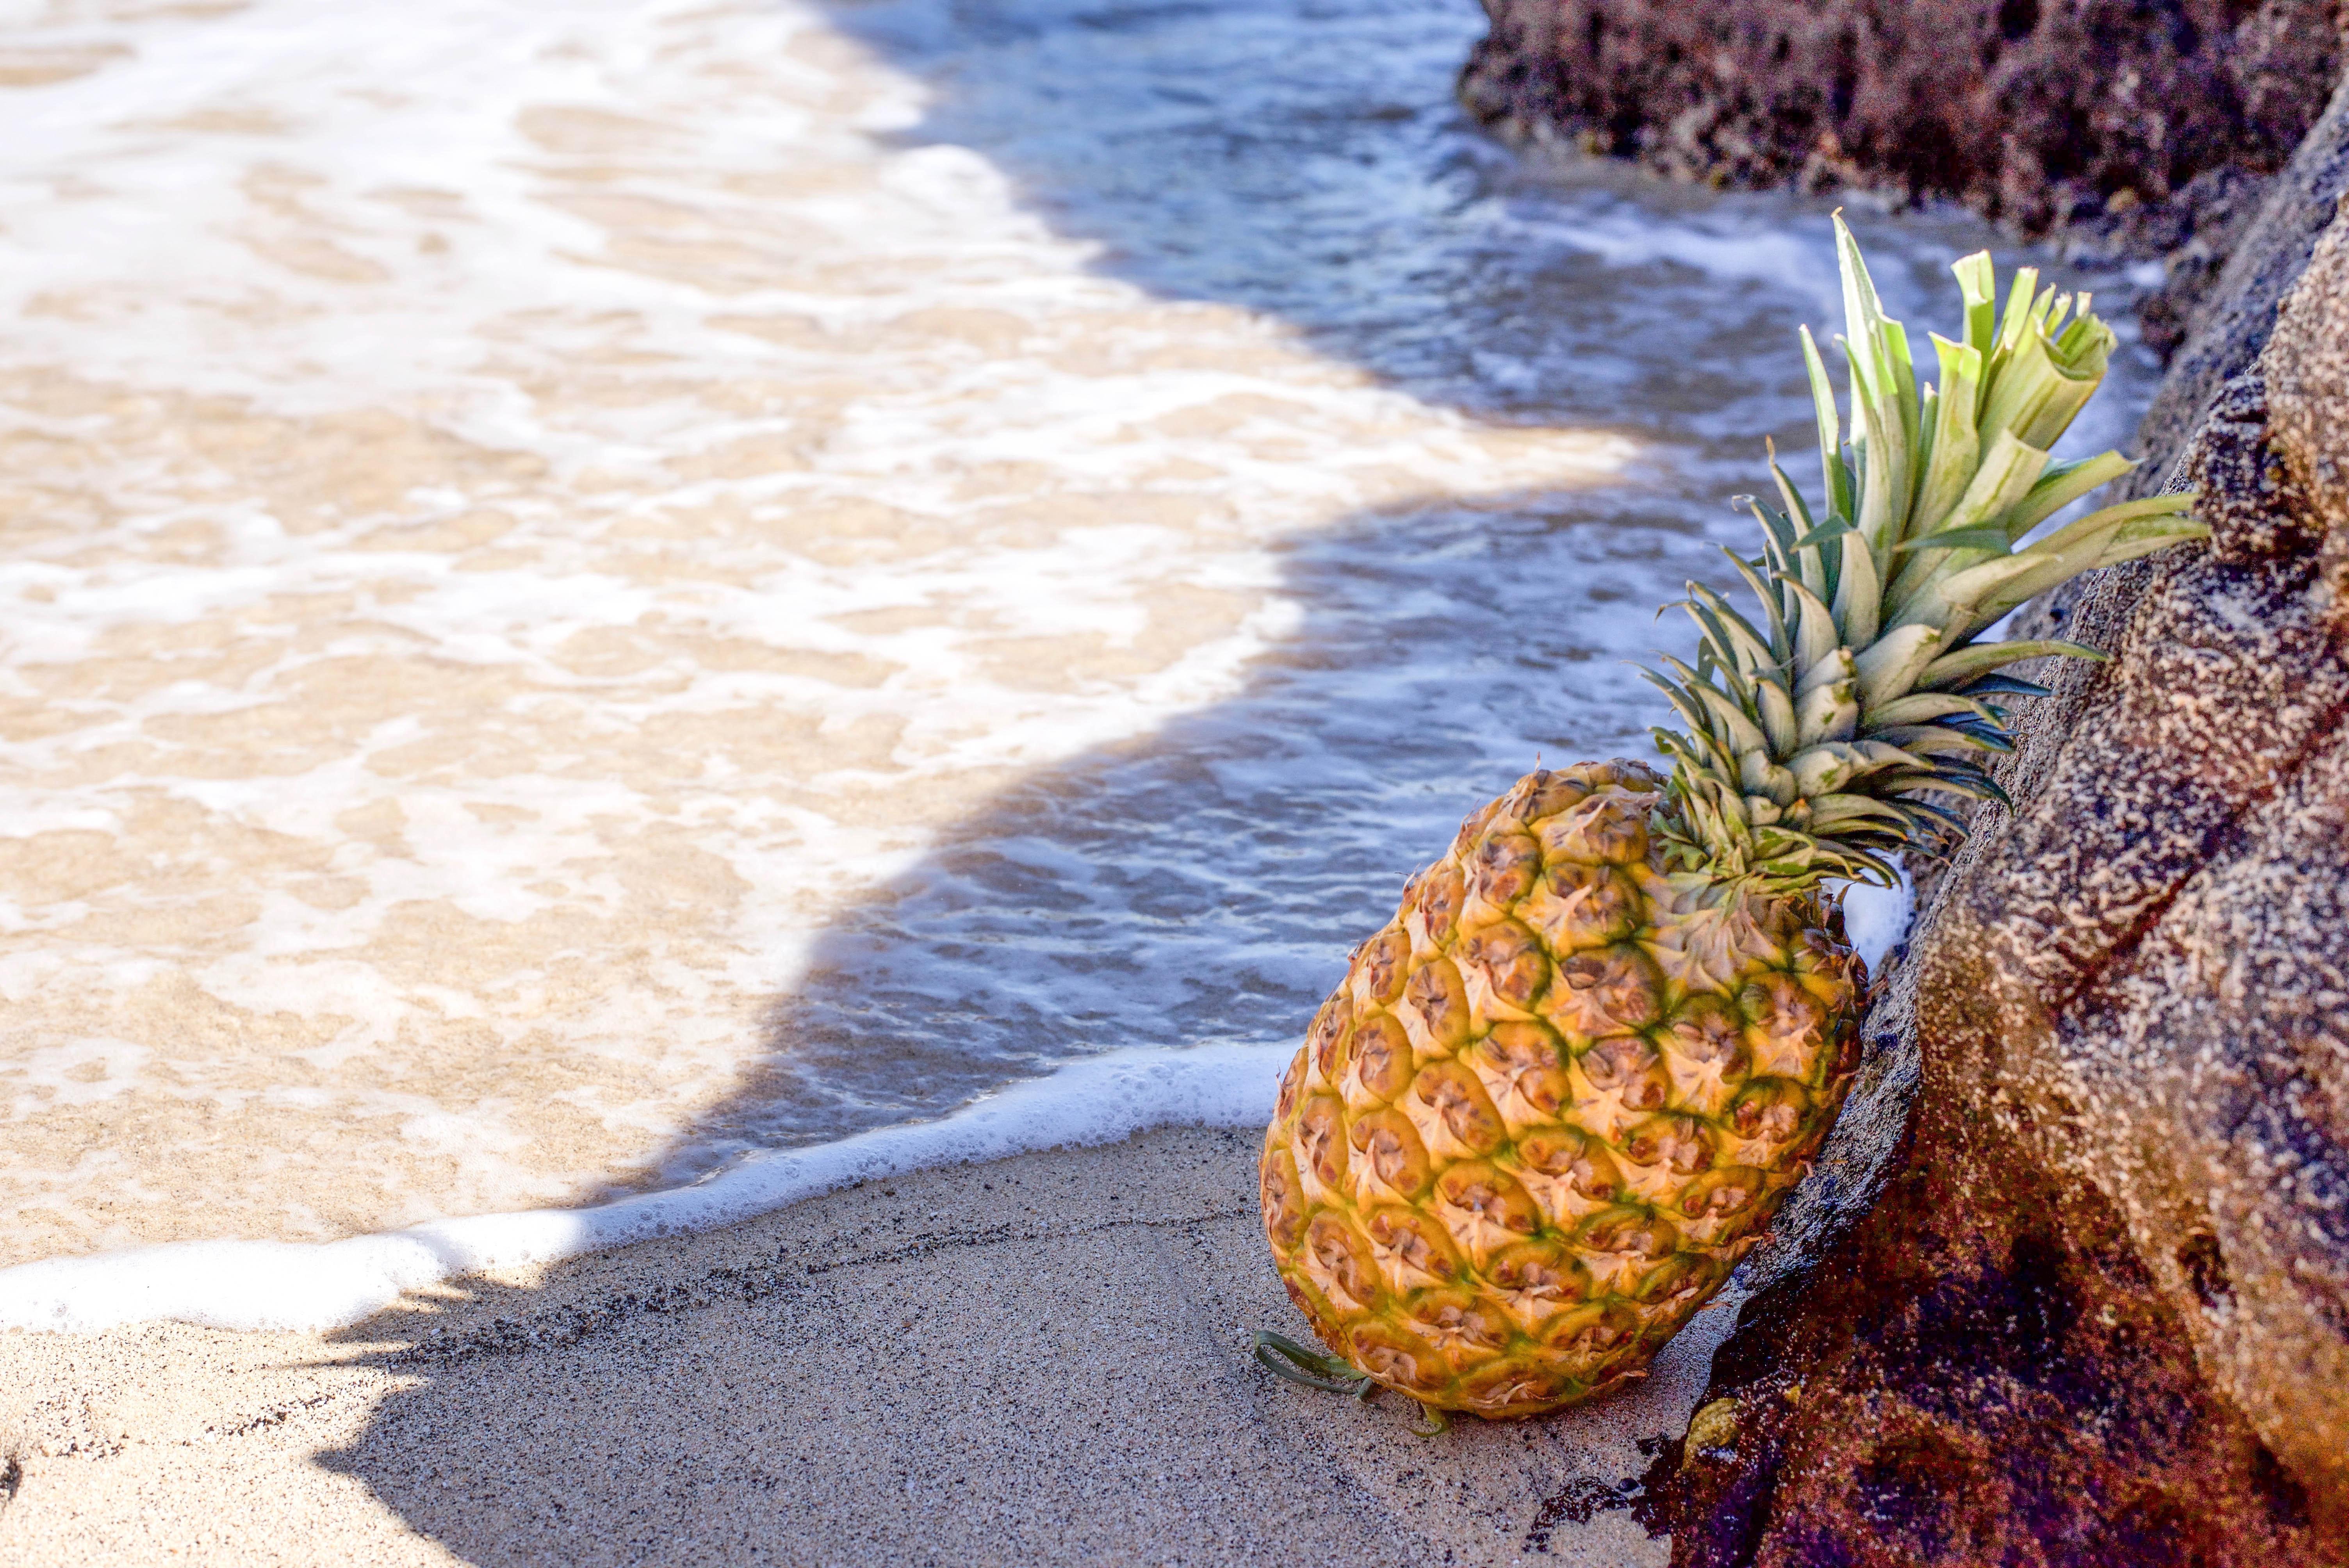 Pineapple in Seashore Leaning on Brown Rock, Beach, Seashore, Water, Vacation, HQ Photo